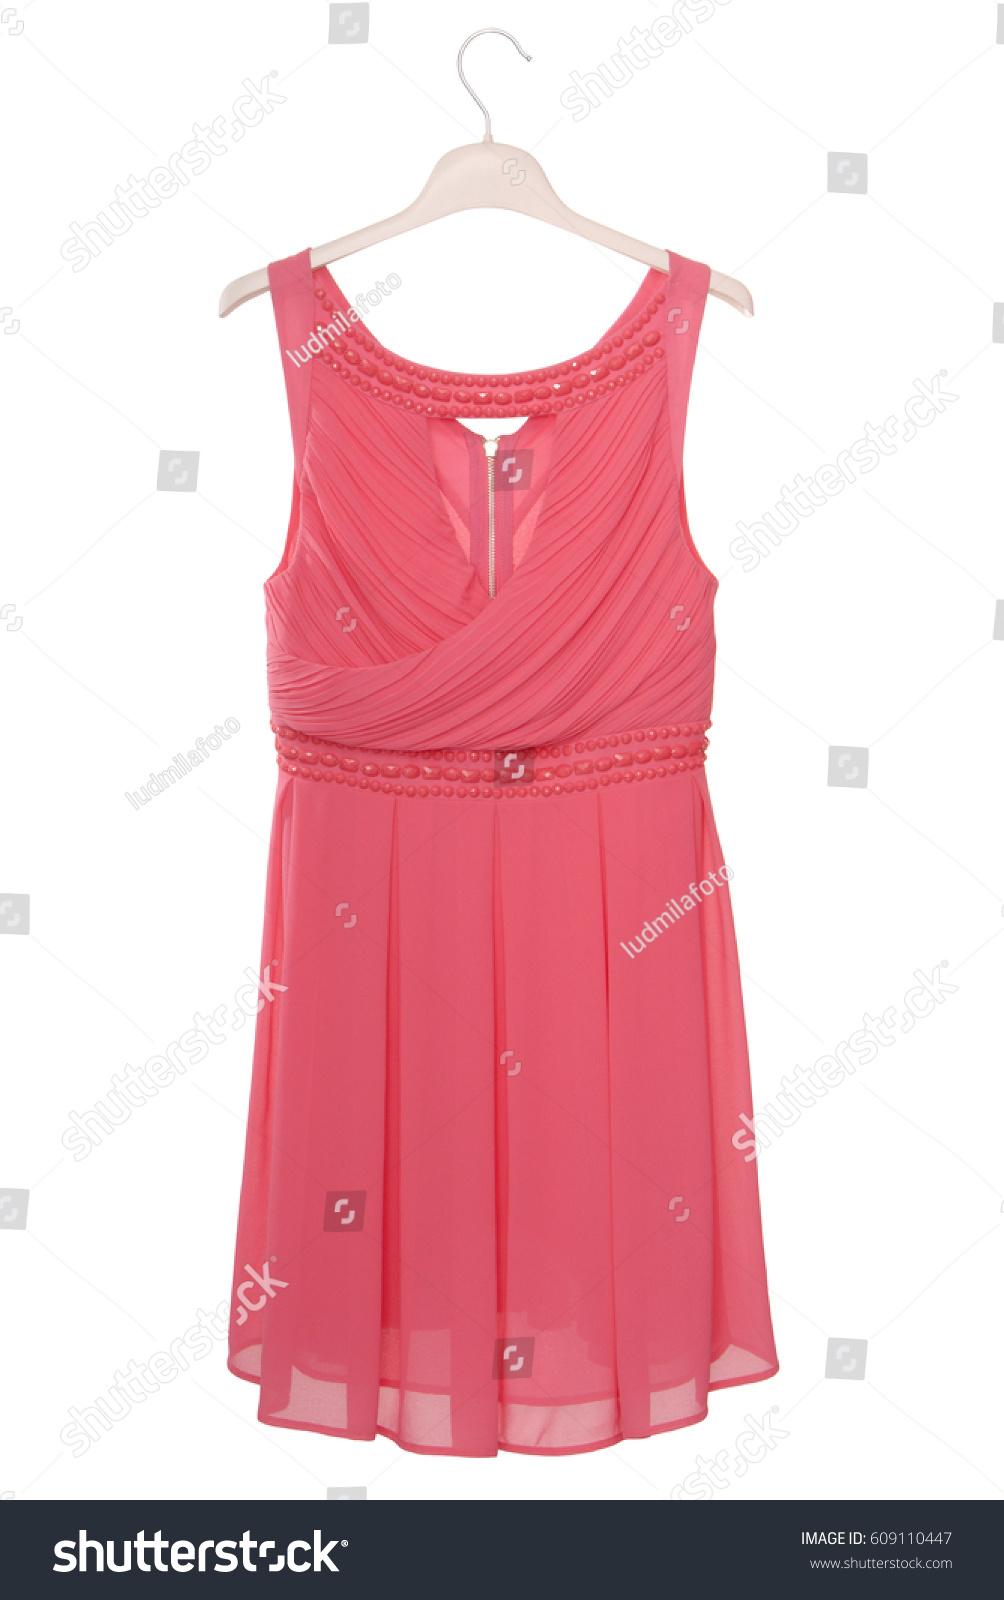 Groß Pink Chiffon Cocktail Dress Fotos - Brautkleider Ideen ...